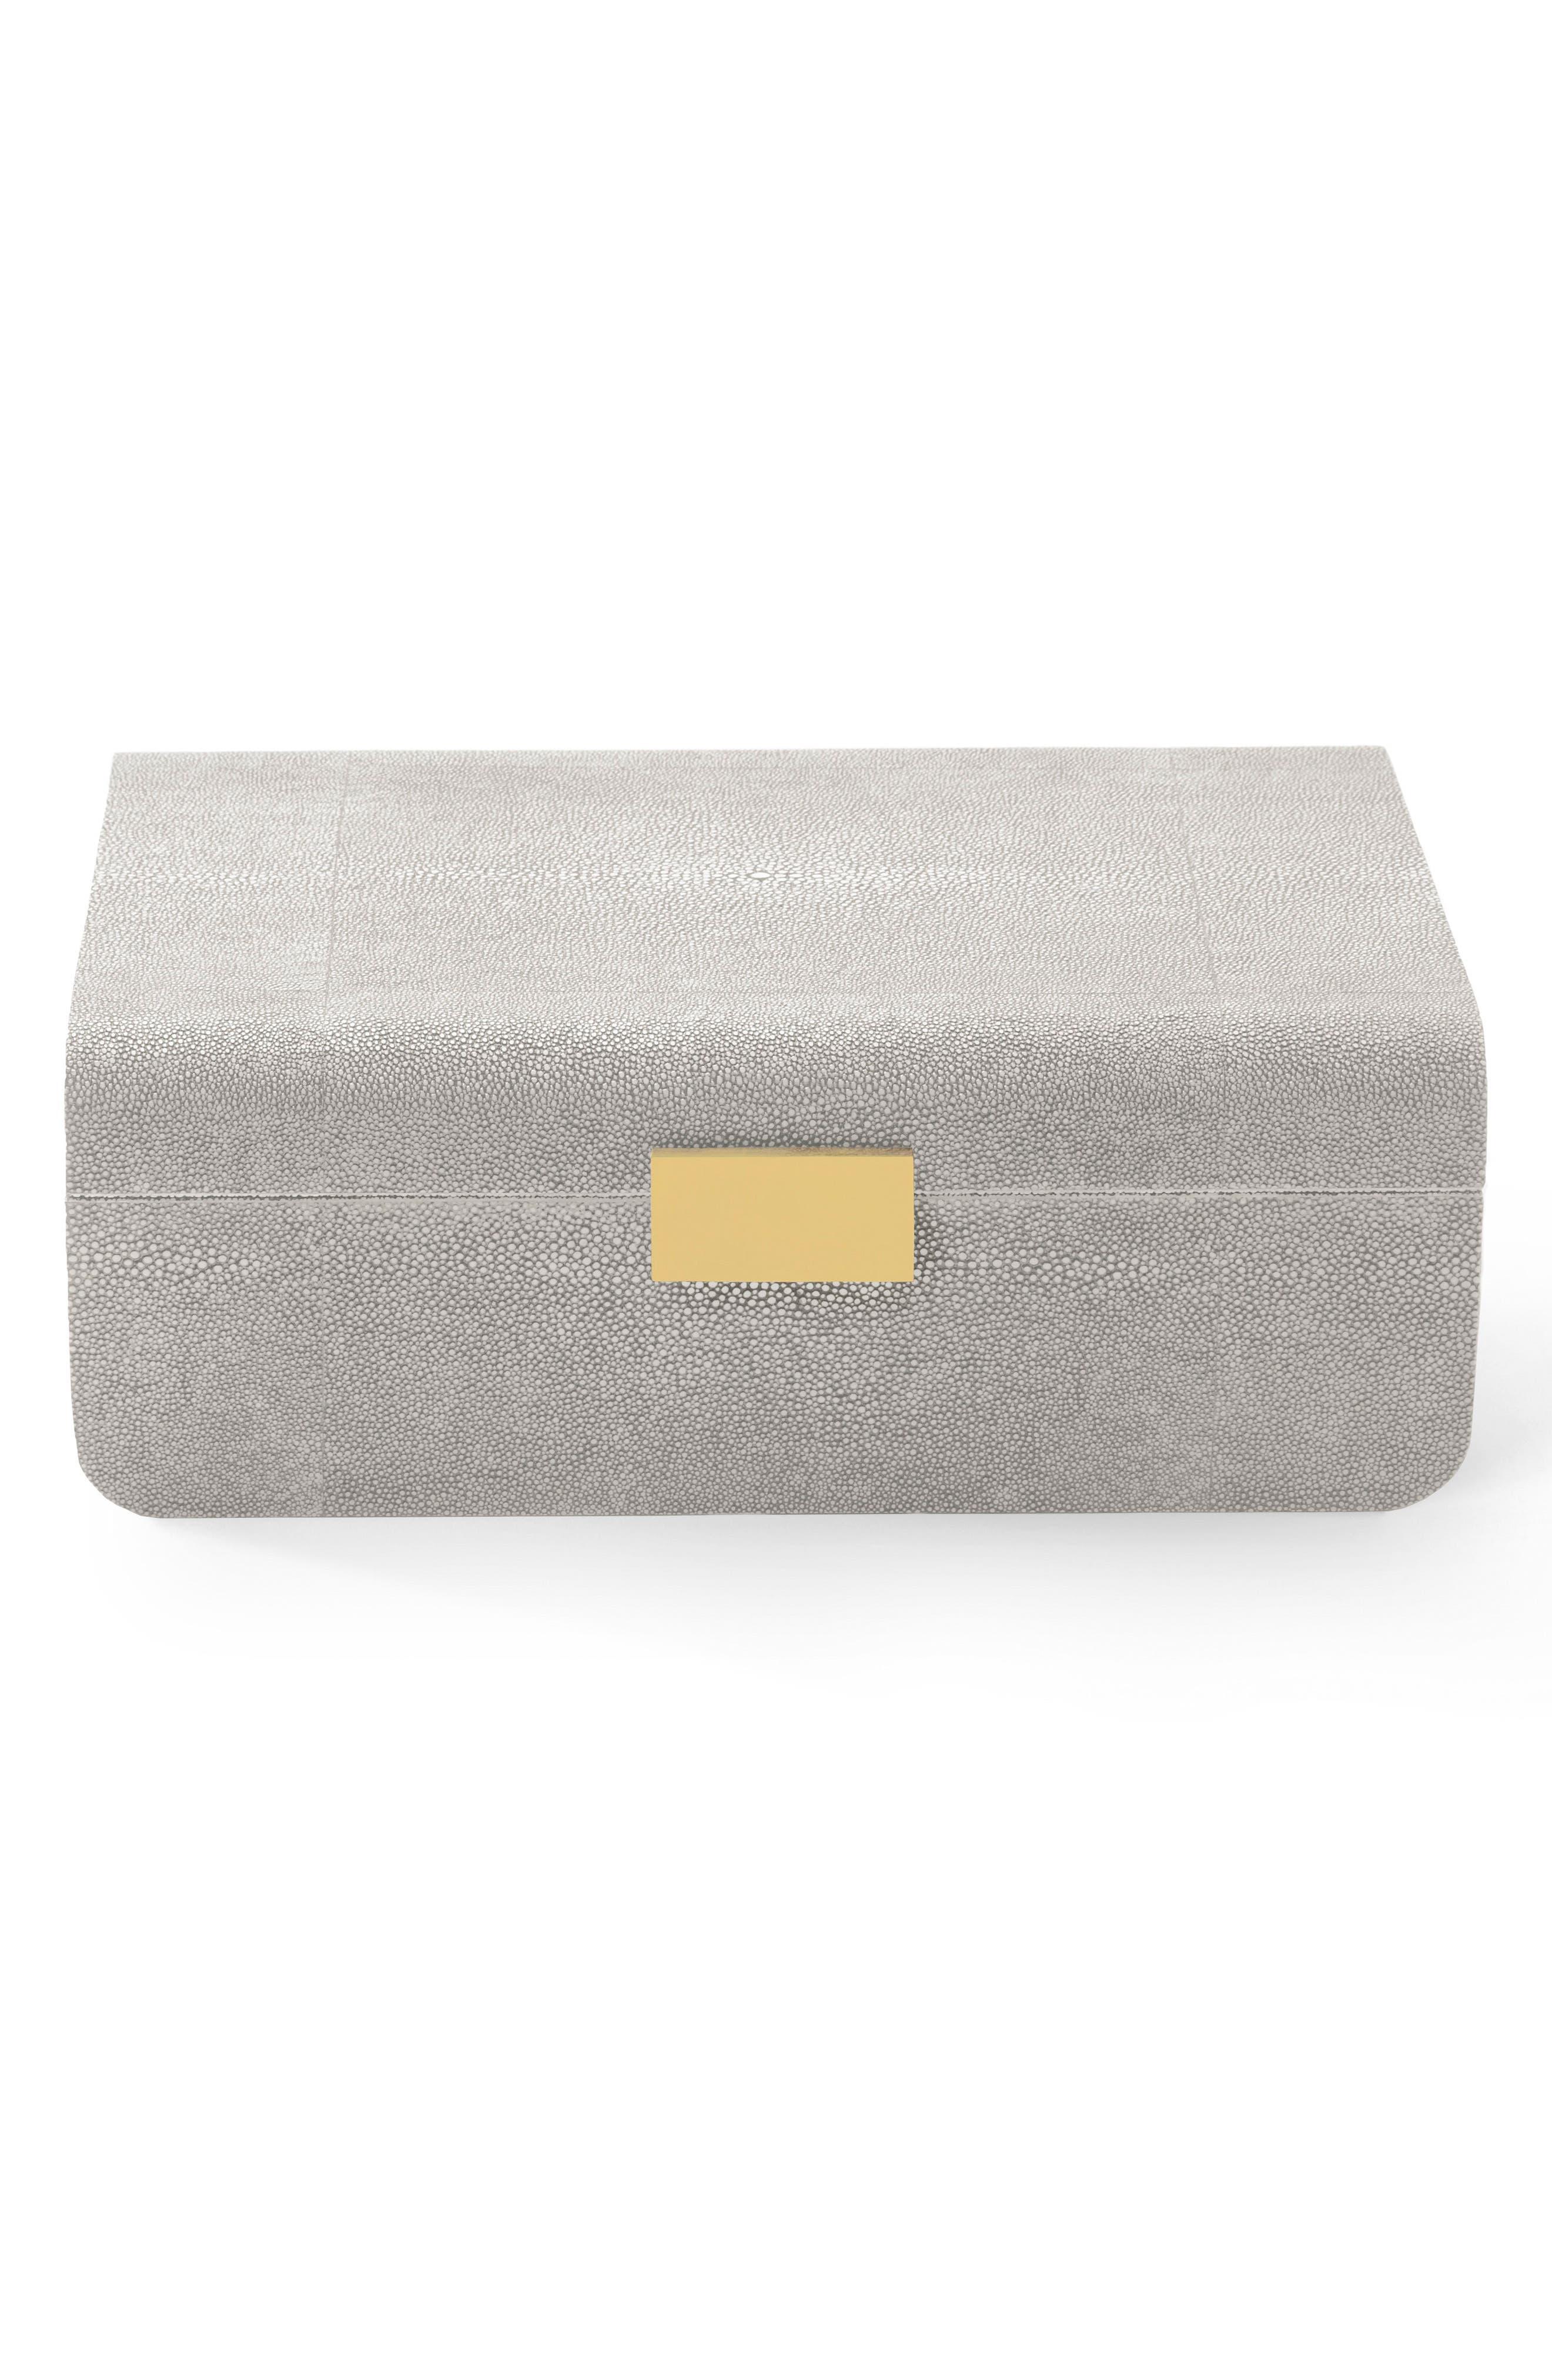 Modern Shagreen Jewelry Box,                             Main thumbnail 1, color,                             020